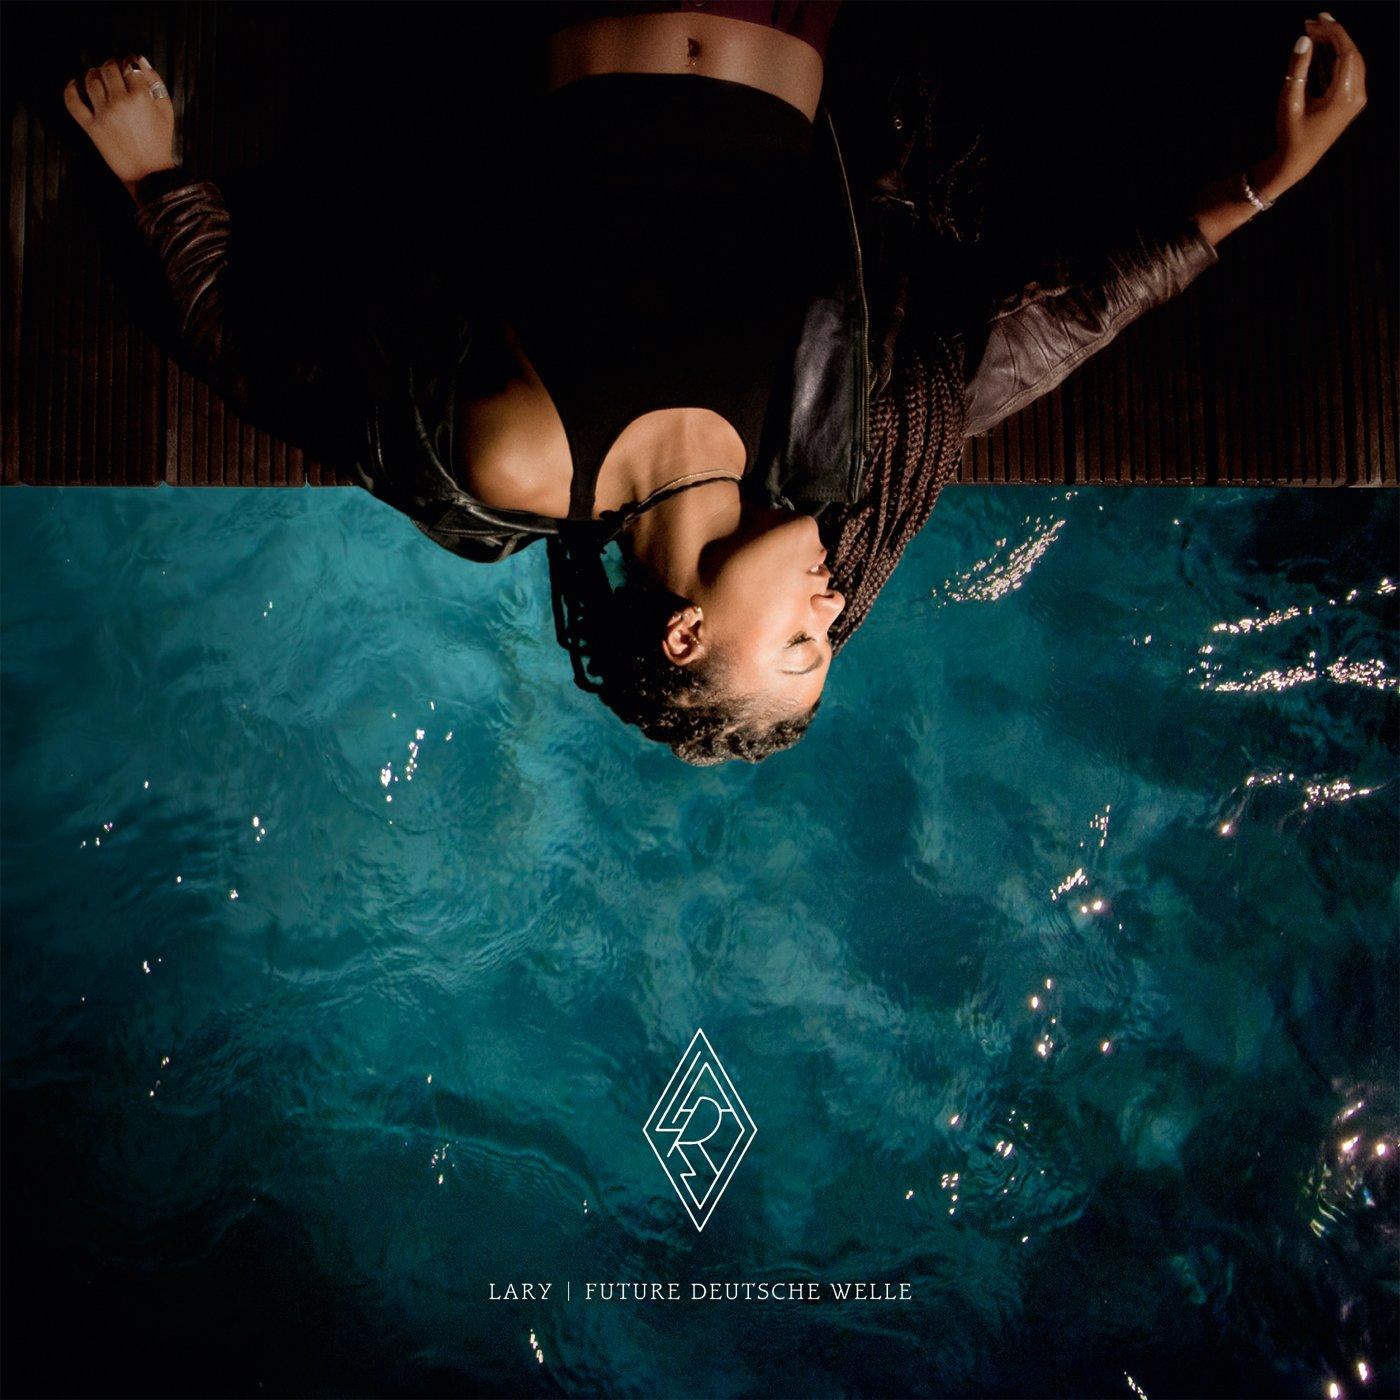 Lary - Future deutsche welle (2014) [Electro , Rap]